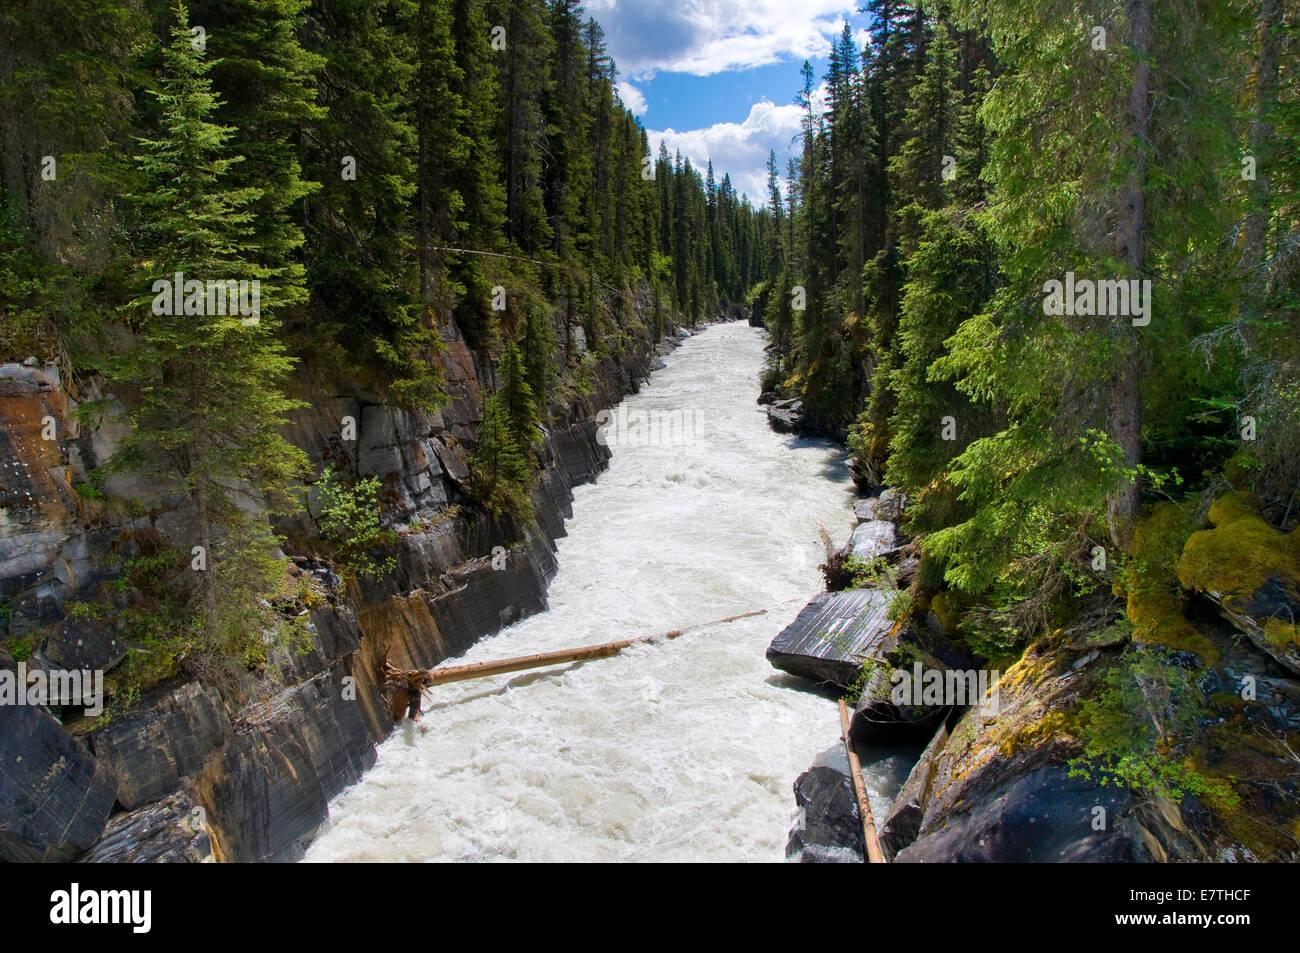 Fall Wallpaper Lake Numa Falls Kootenay National Park British Columbia